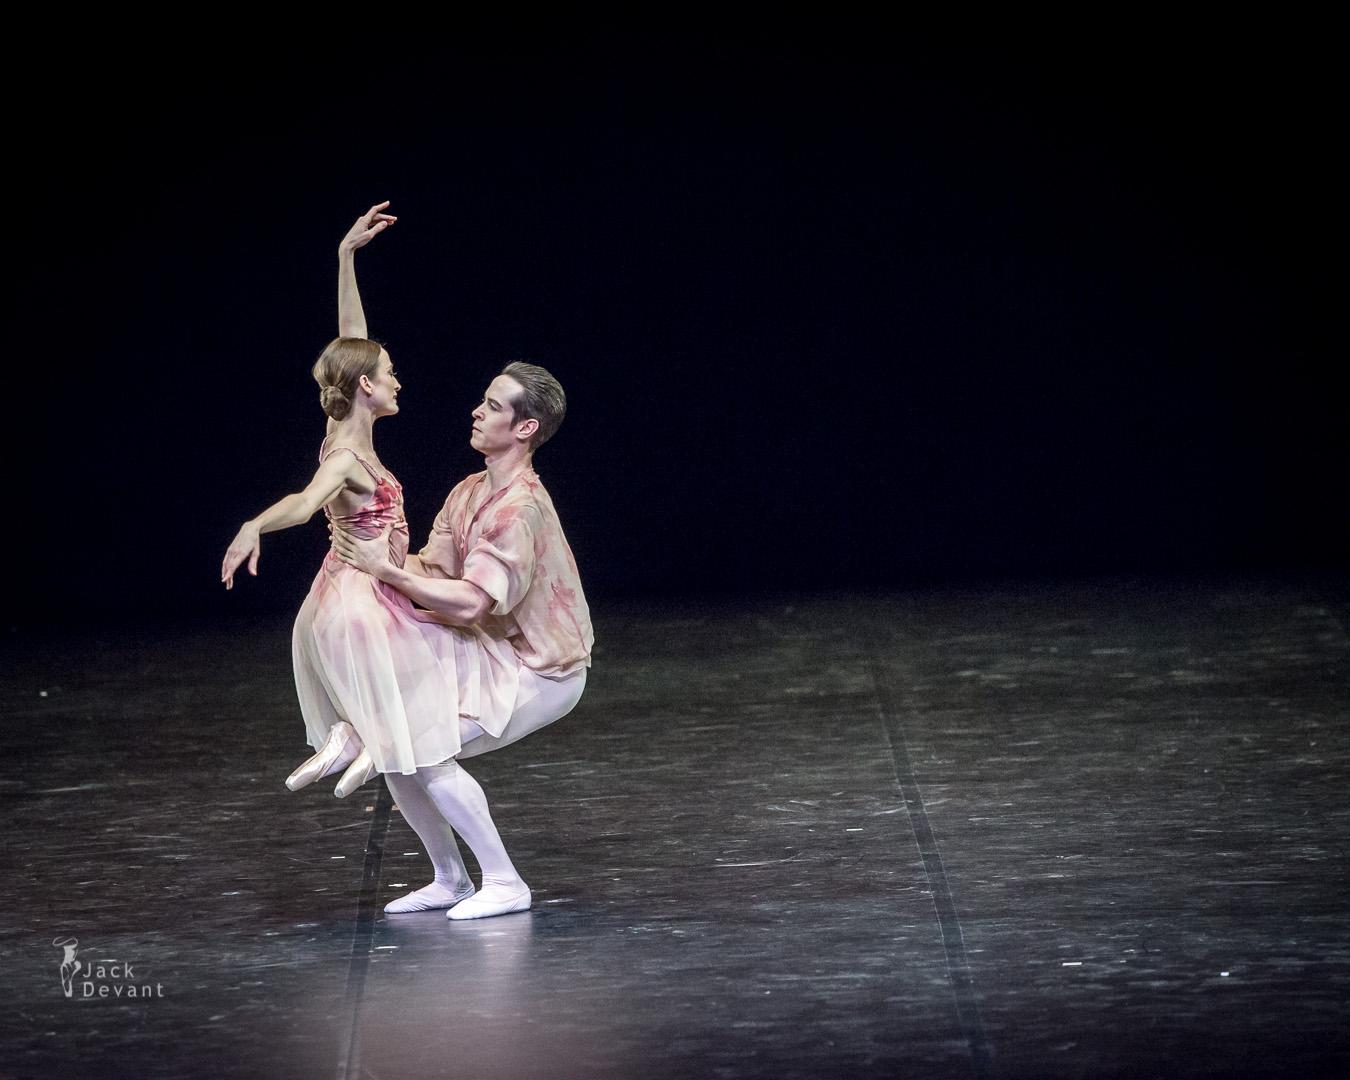 sascha radetsky ballet dancer